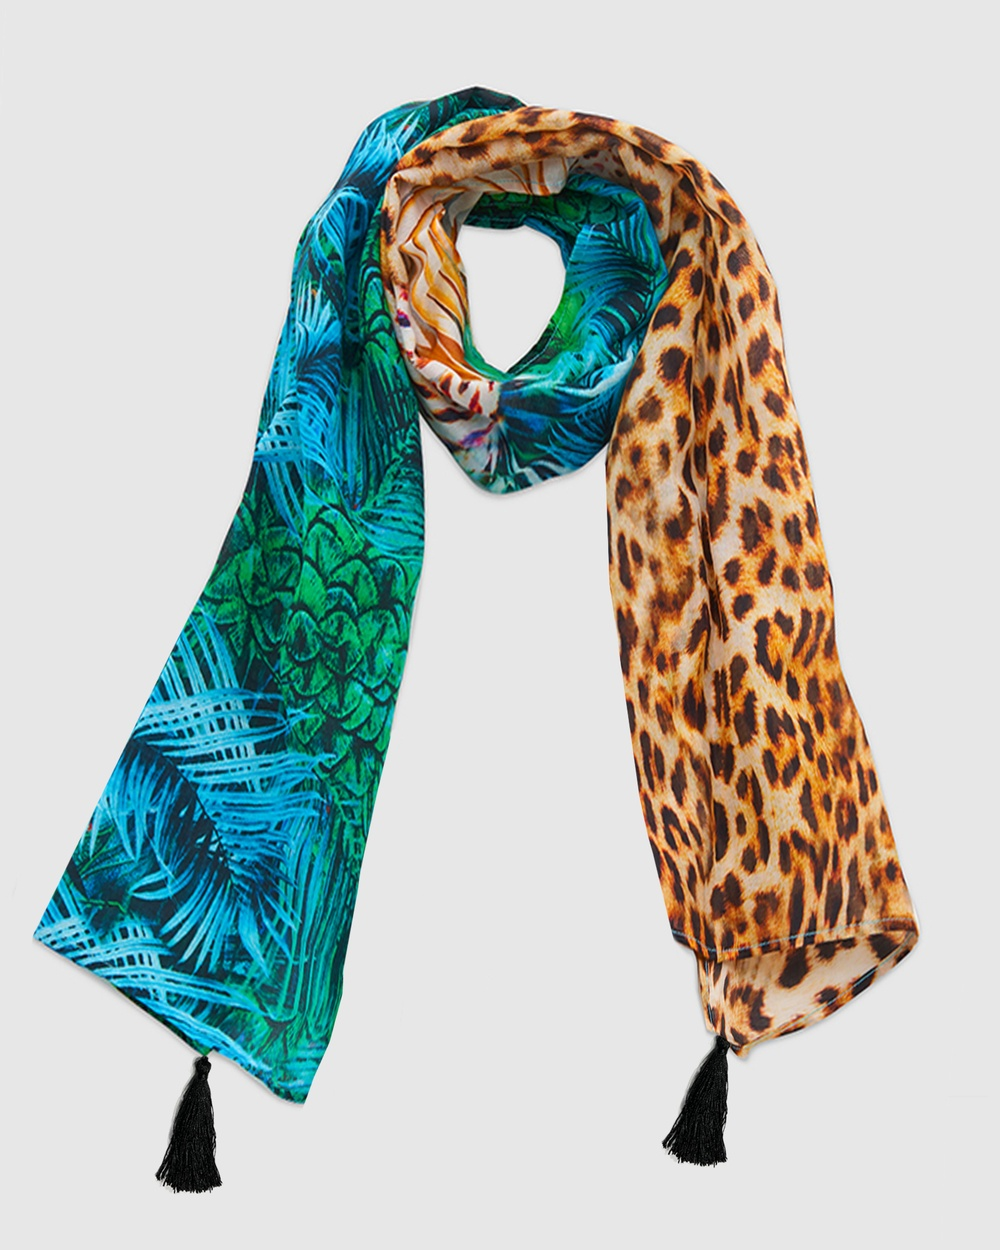 Aqua Blu Australia Elysian Scarf Scarves & Gloves Elysian